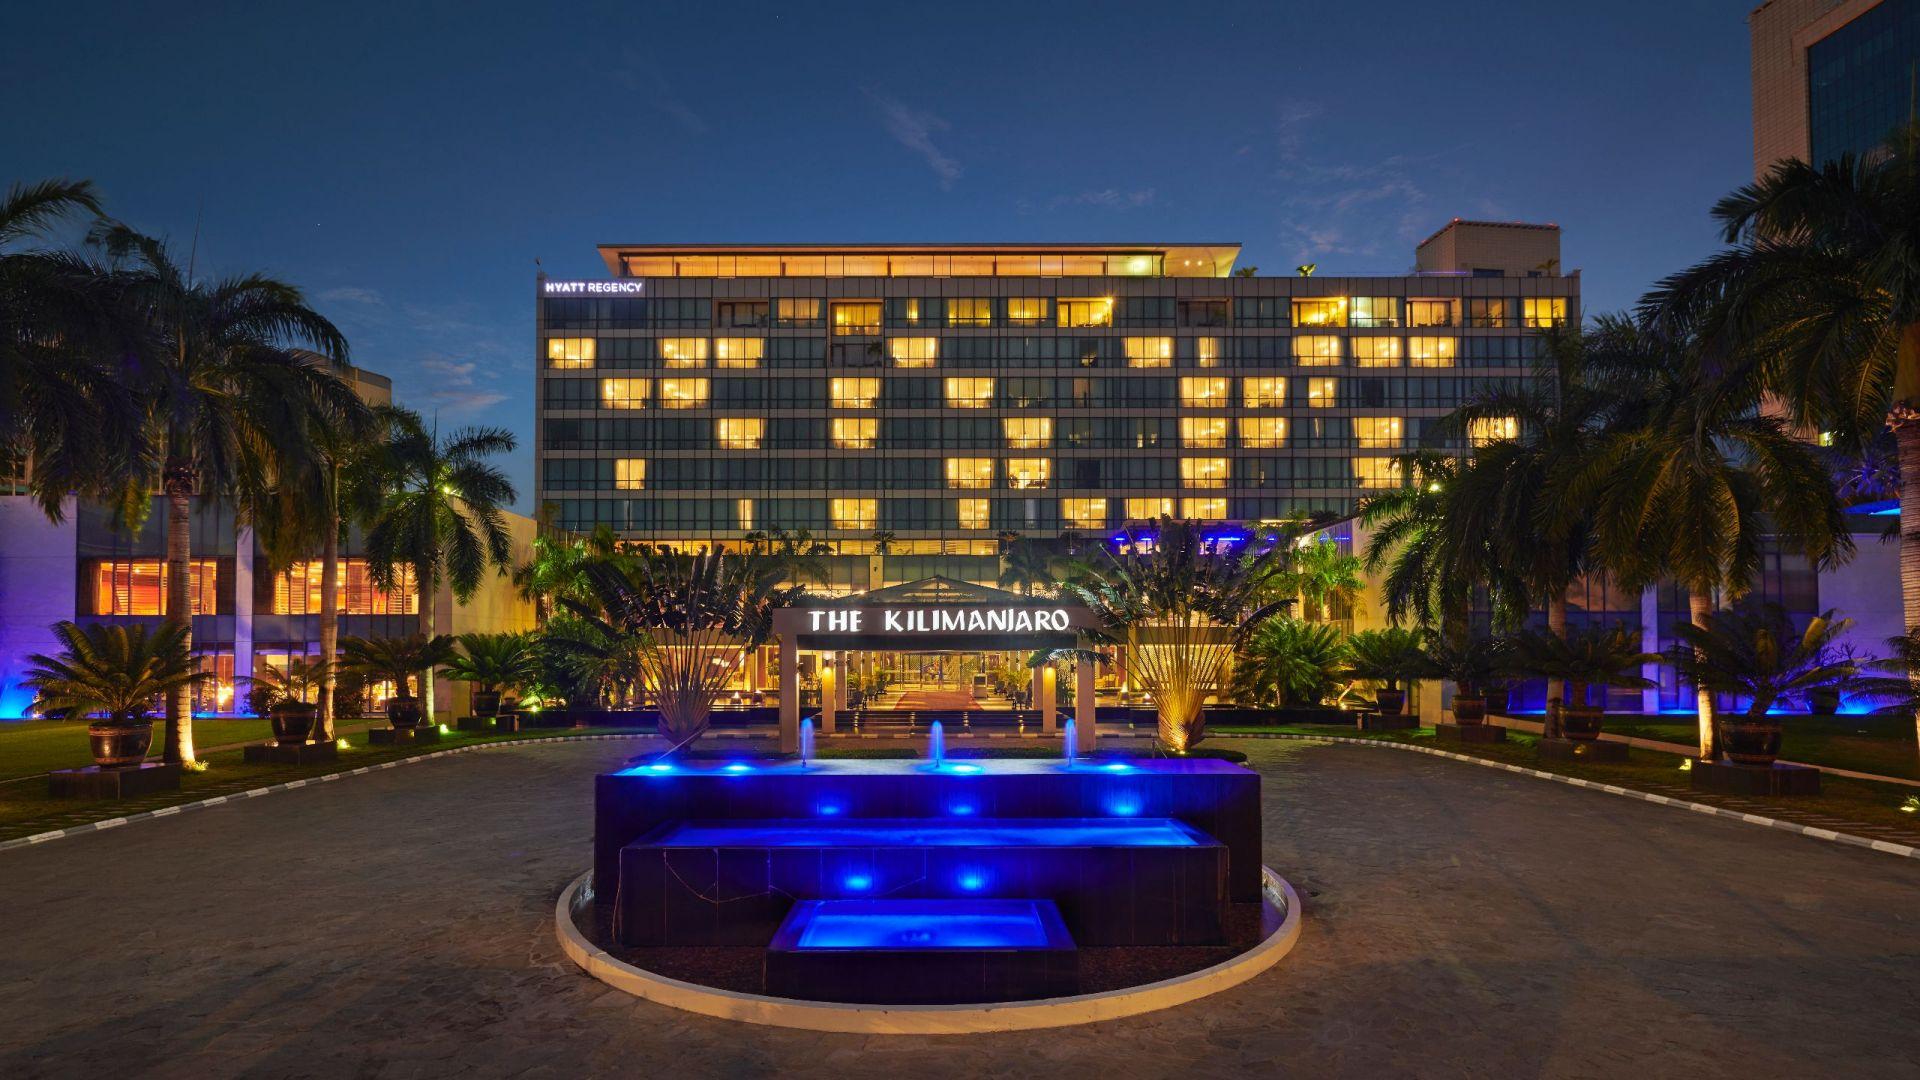 Hotel Hyatt Regency Dar es Salaam